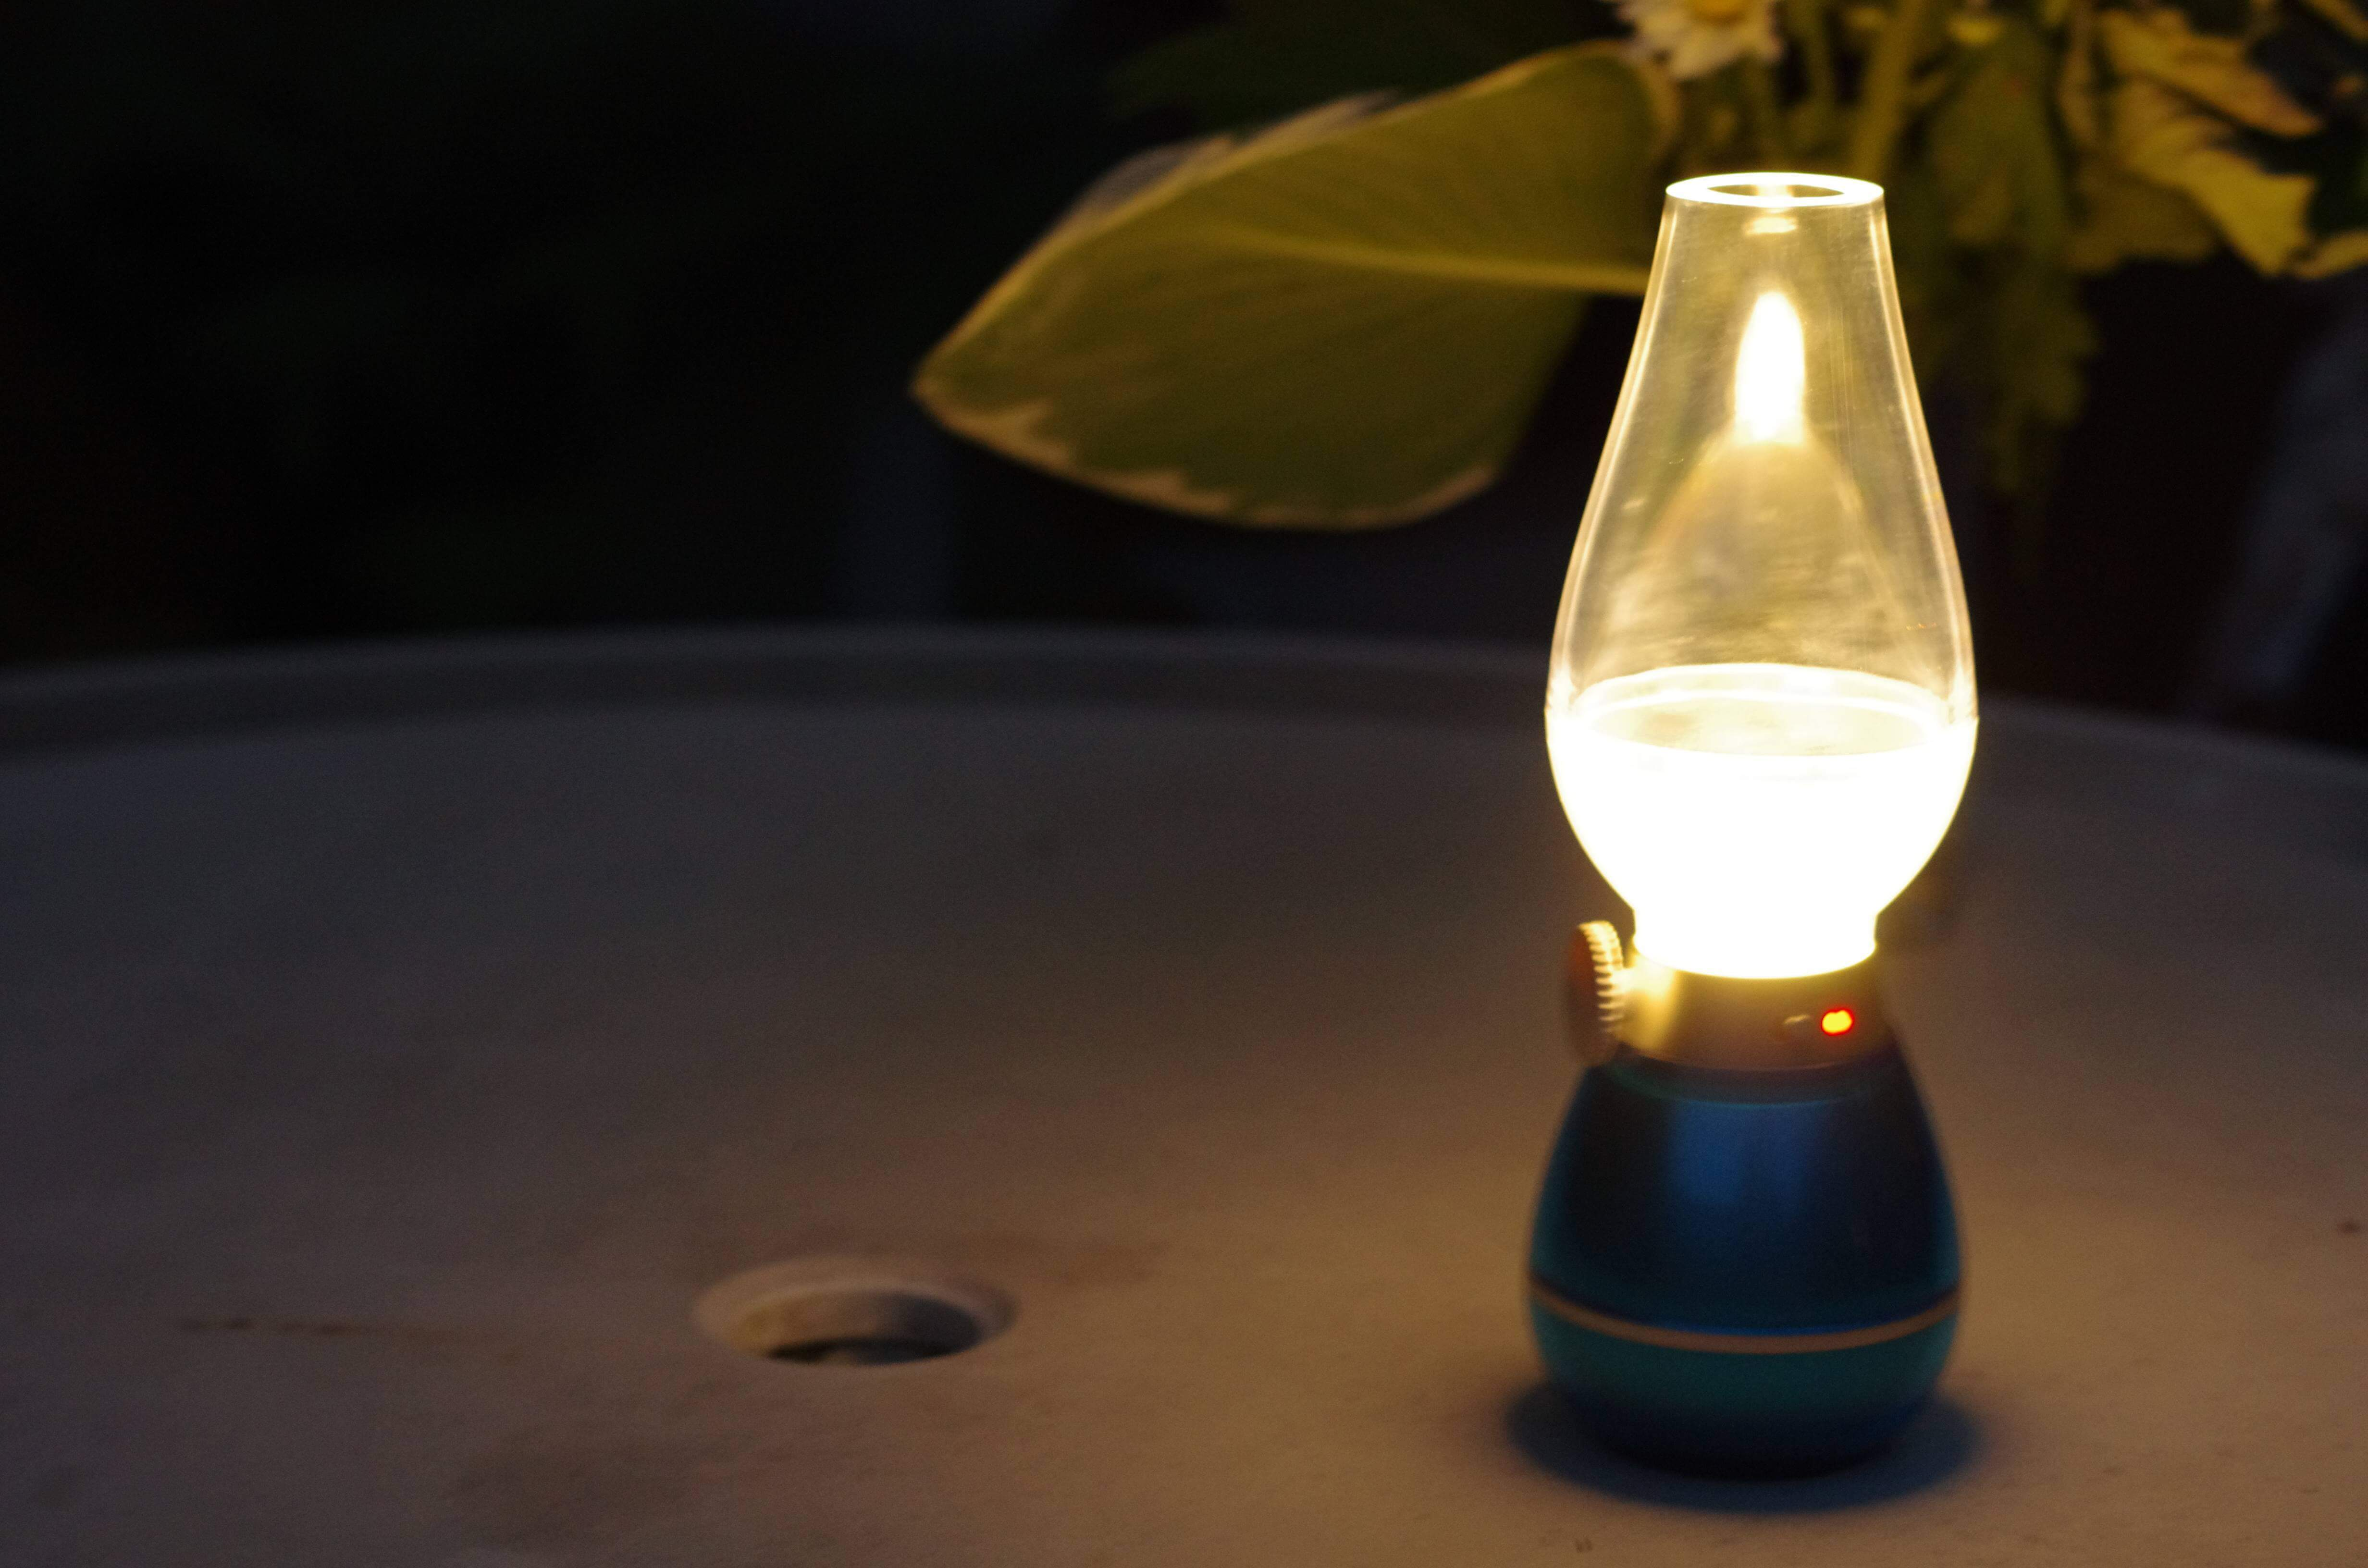 onite klassische lampe led akku marioeggers de. Black Bedroom Furniture Sets. Home Design Ideas